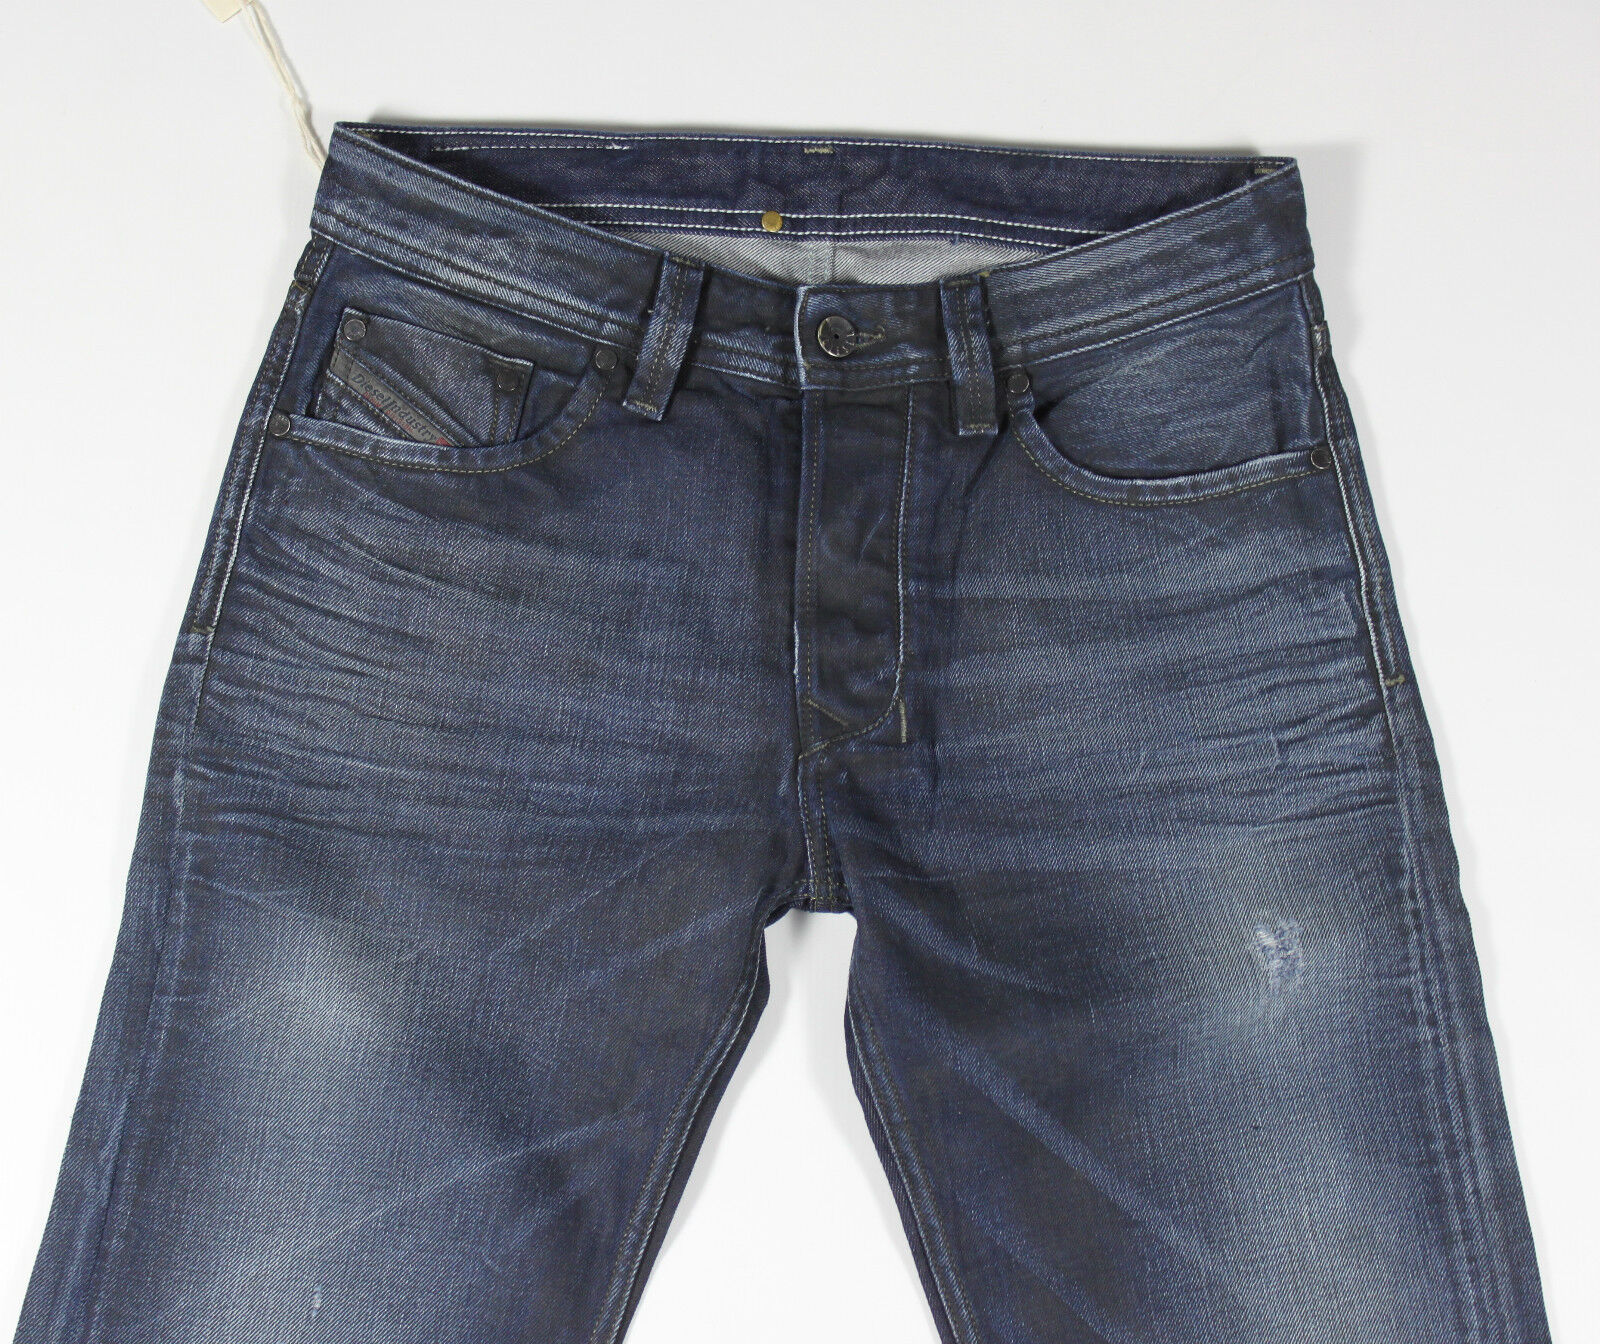 DIESEL Nuovo di di di Zecca Larkee 880 F Jeans 0880 F 28X30 Regular Fit Straight Leg da3160